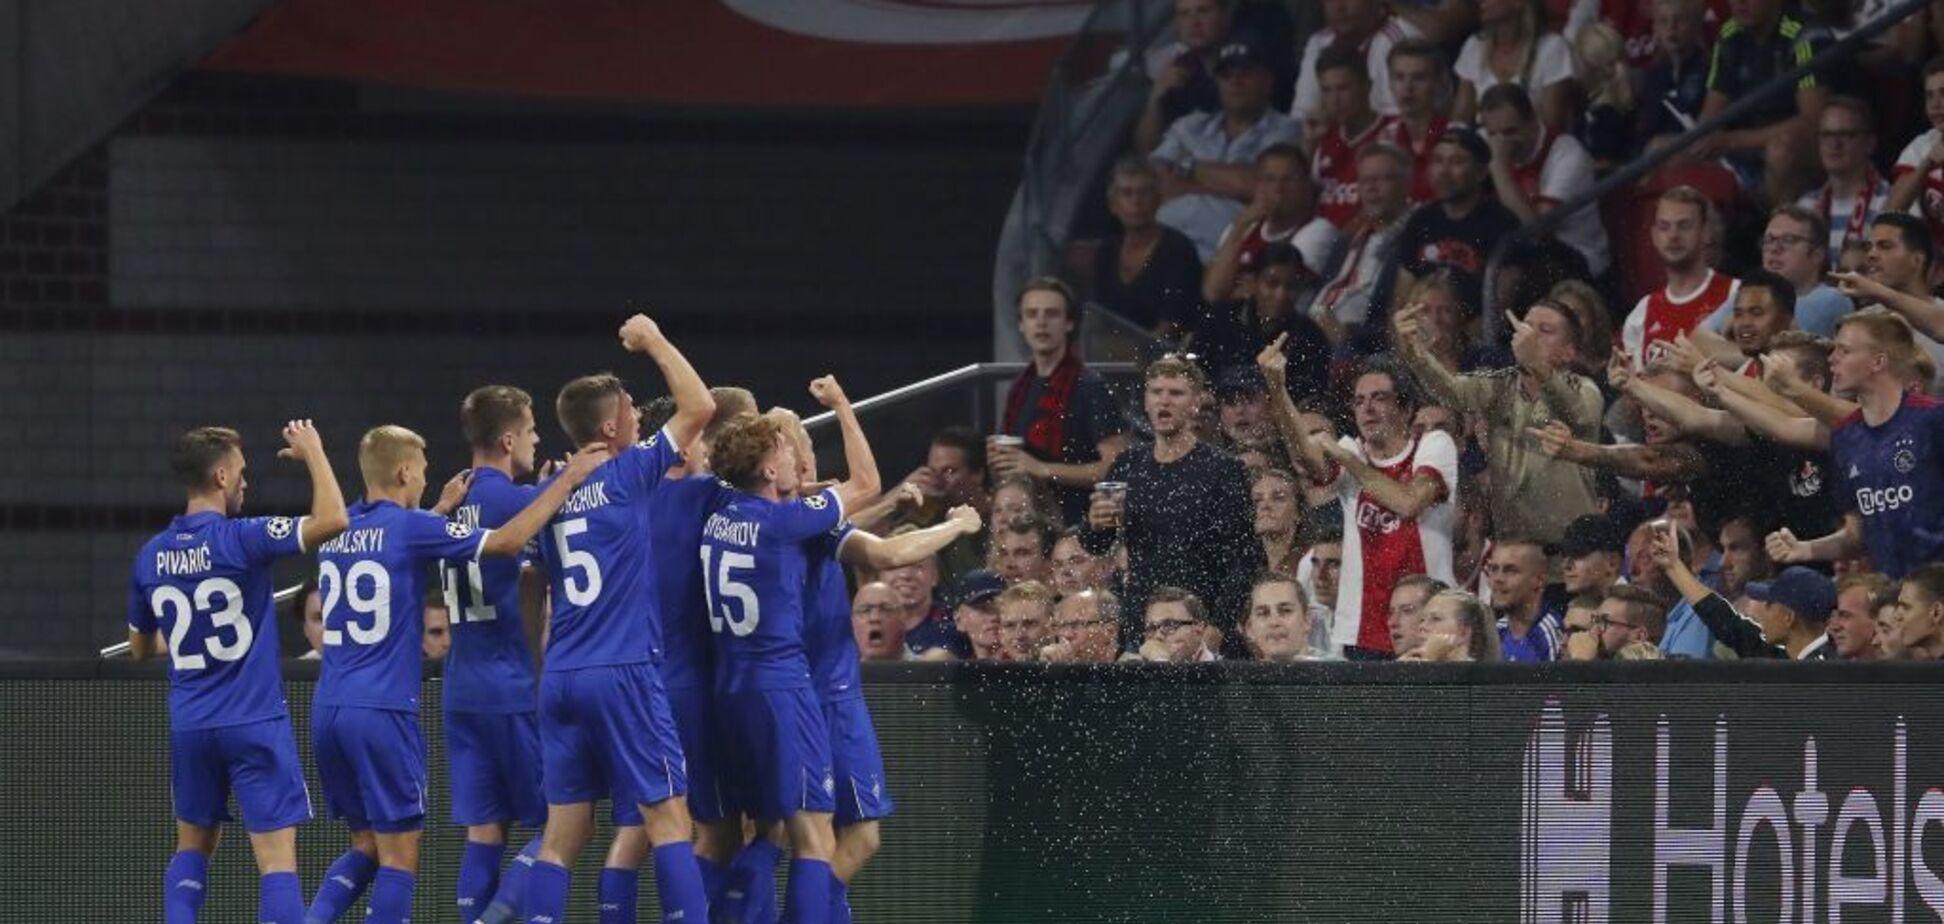 Футболист 'Динамо' получил в лицо от фанатов в матче с 'Аяксом' - опубликовано видео